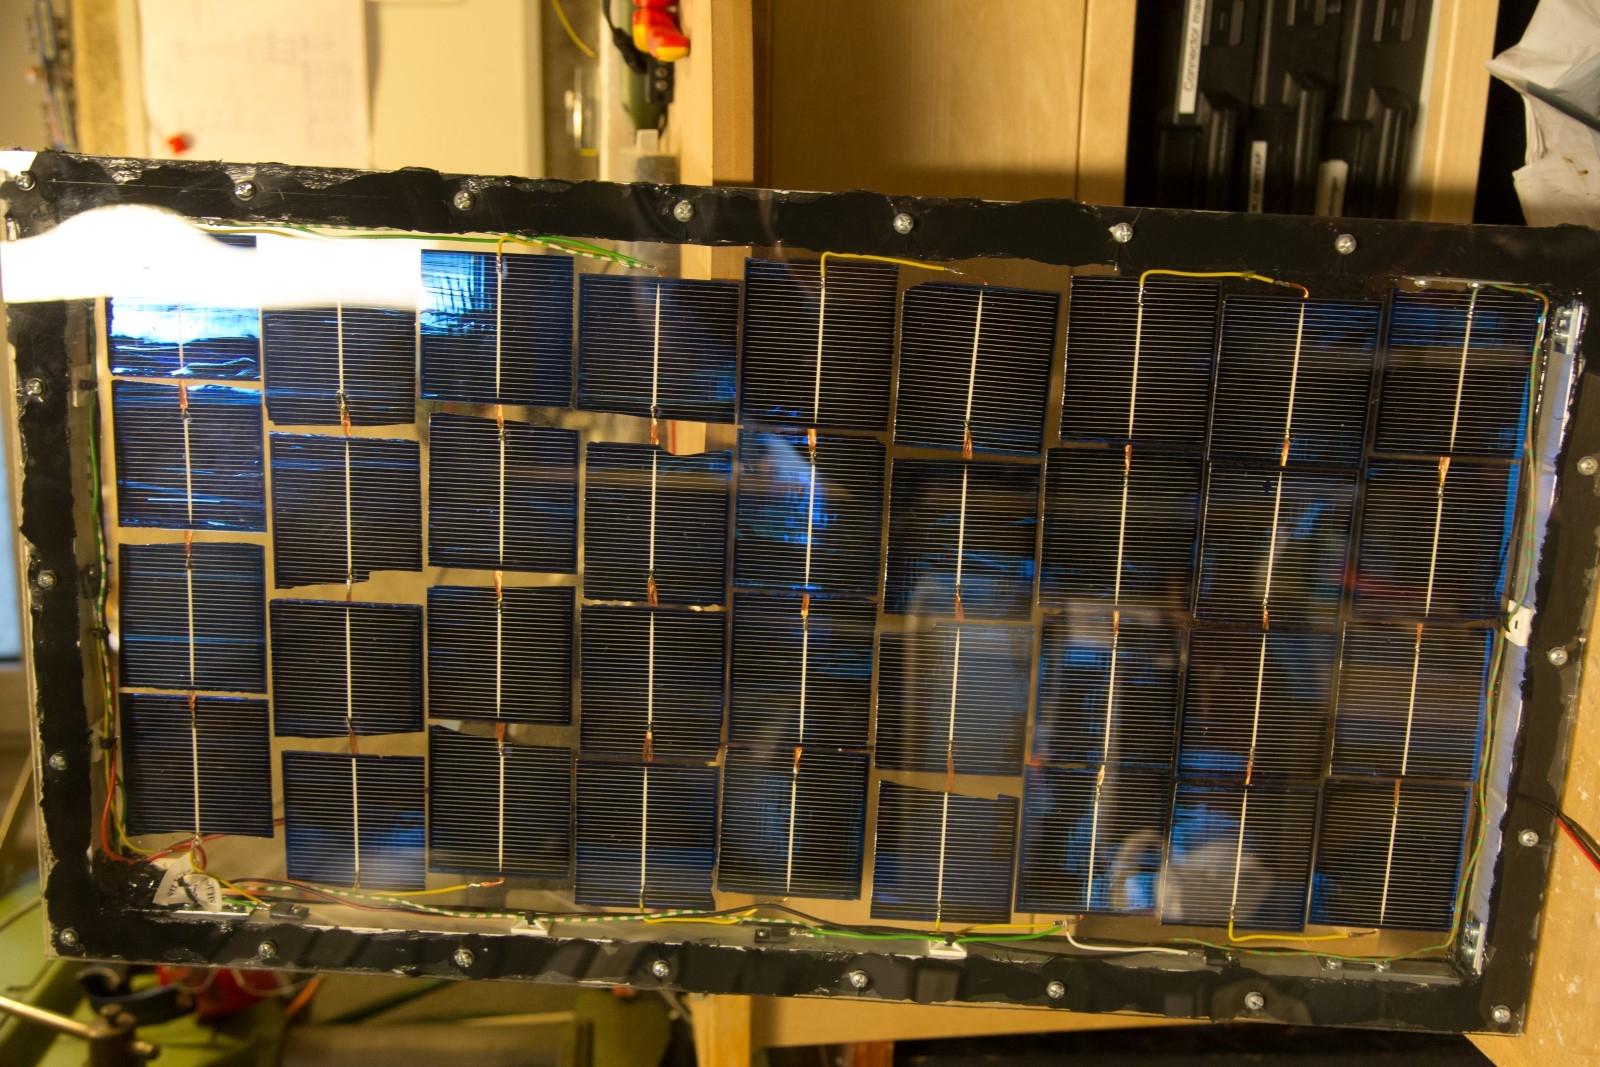 DIY homemade solar panel power generation finished